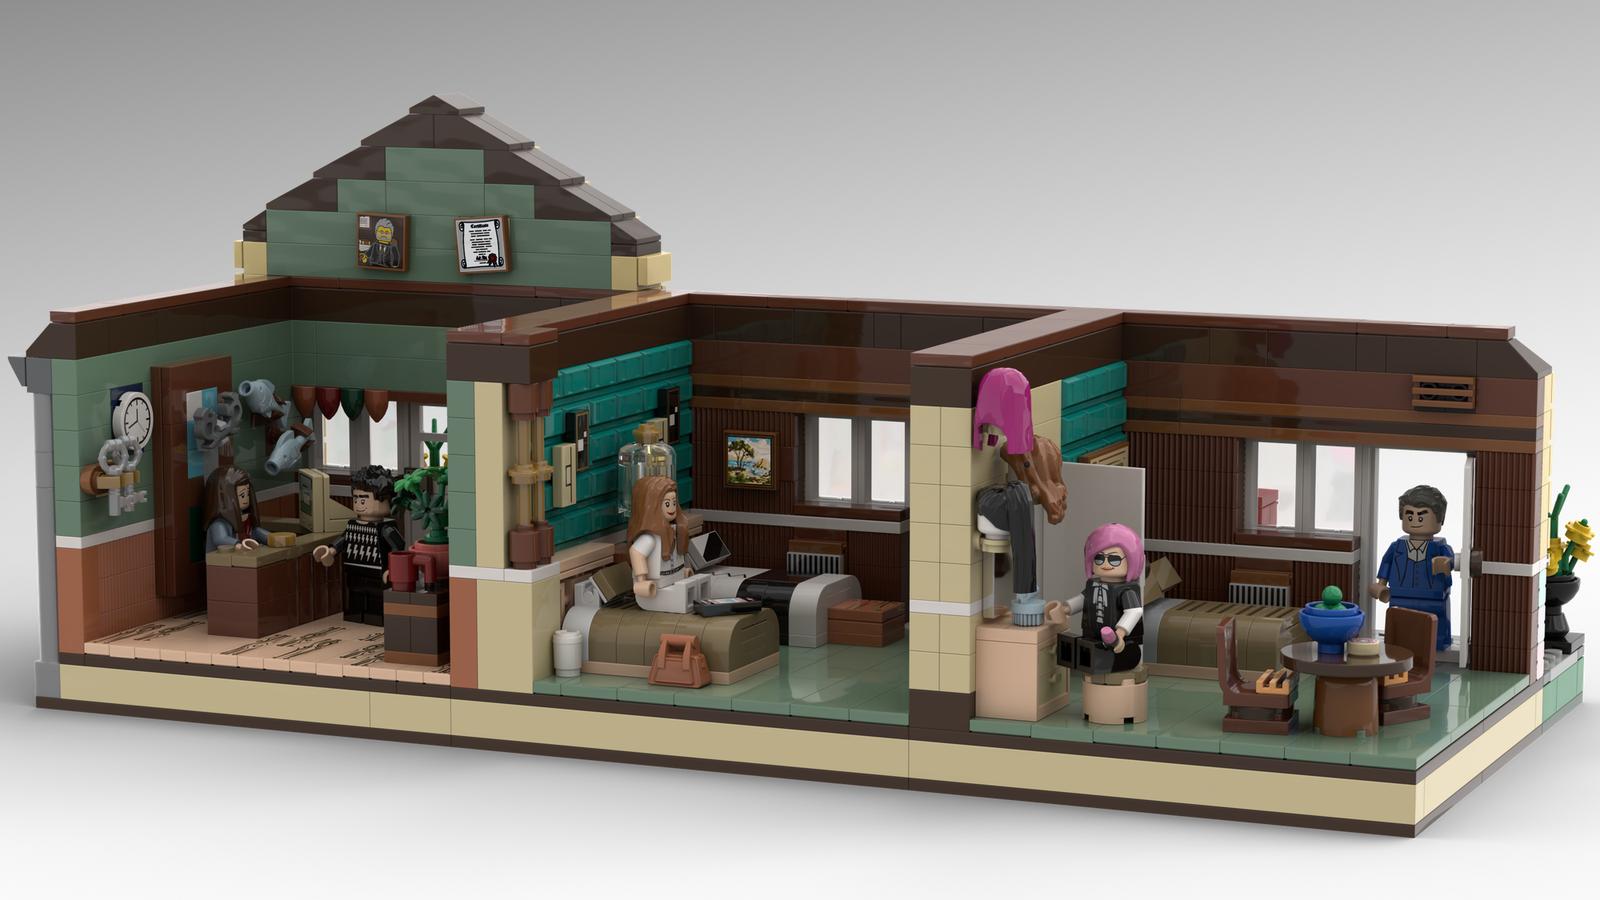 lego-ideas-schitts-creek-the-rosebud-motel-seemarkgeek-2 zusammengebaut.com